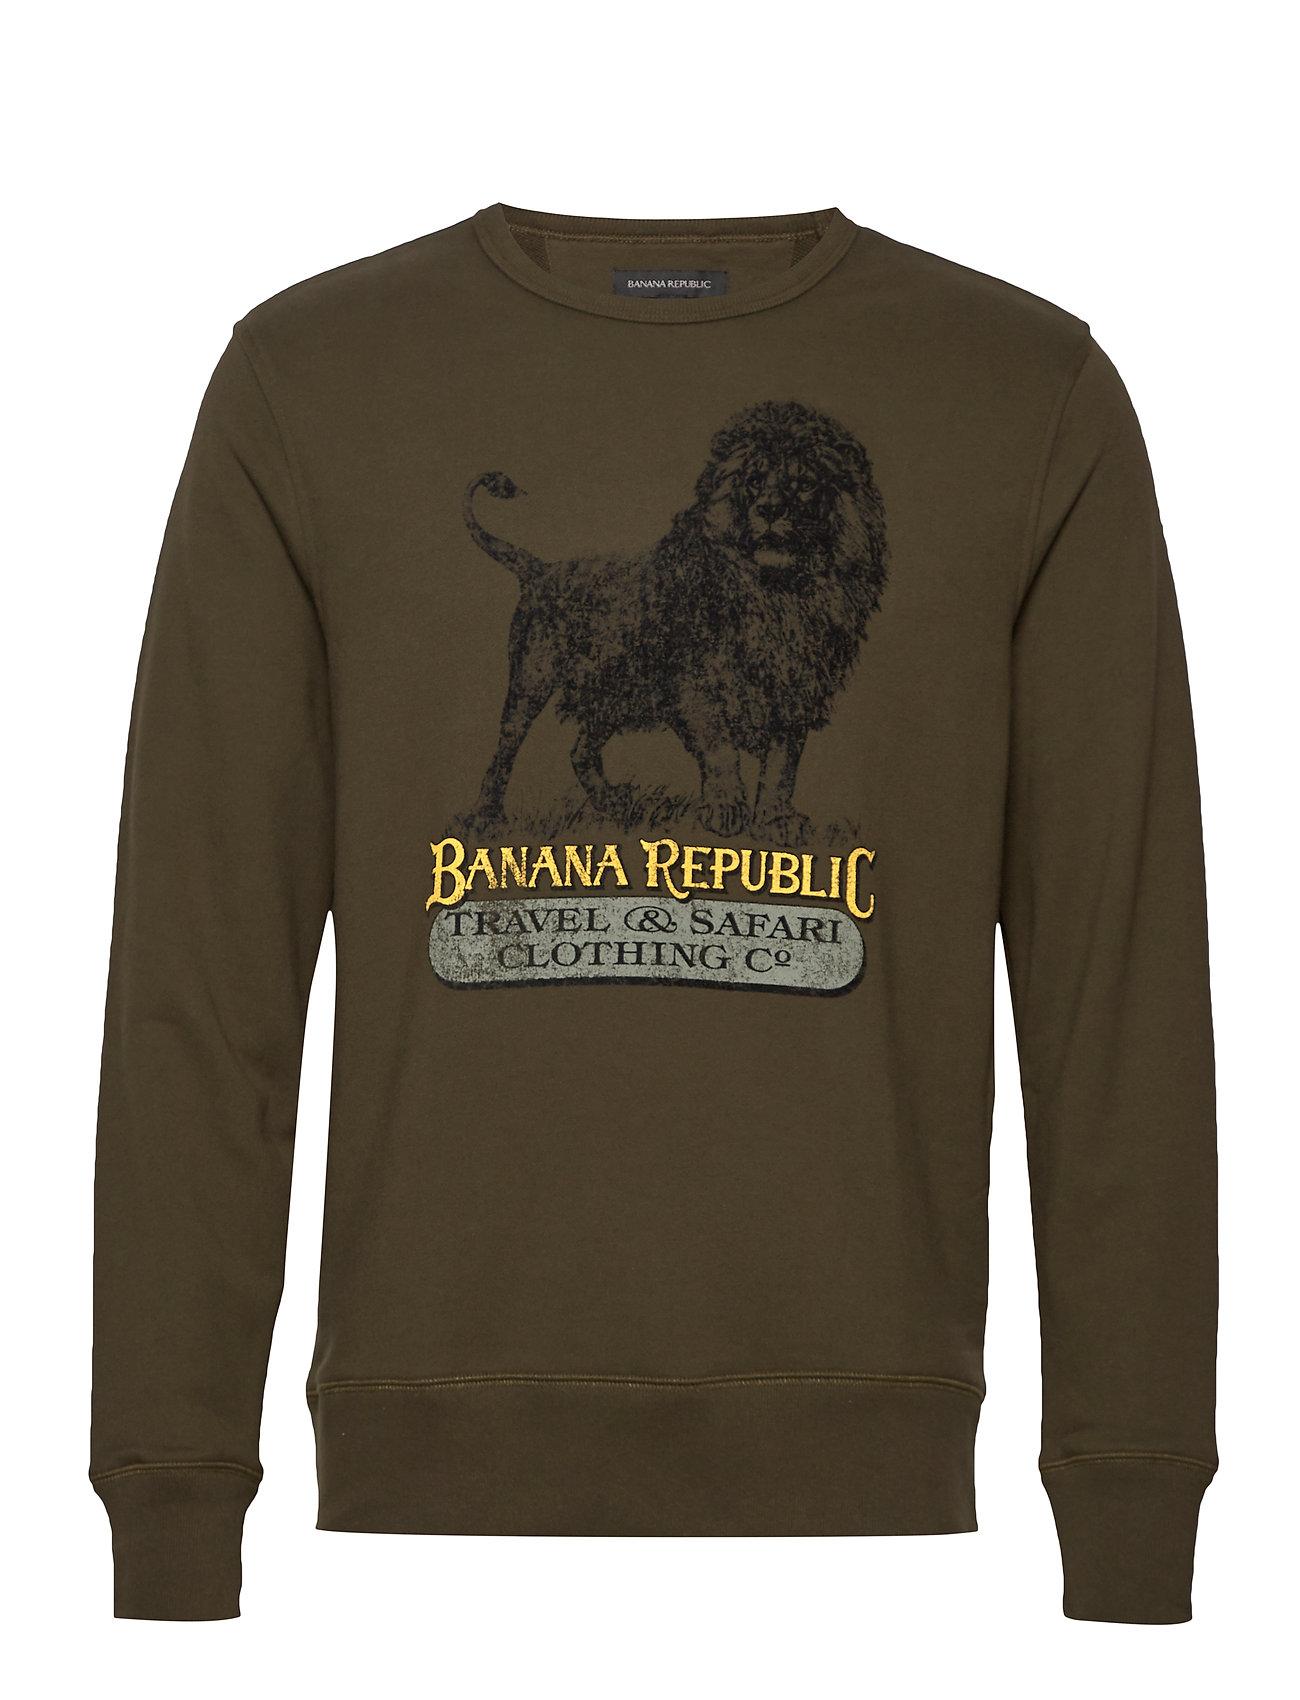 Banana Republic I TERRY SWEATSHIRT LION GRAPHIC CREW - ADIRONDACK GREEN